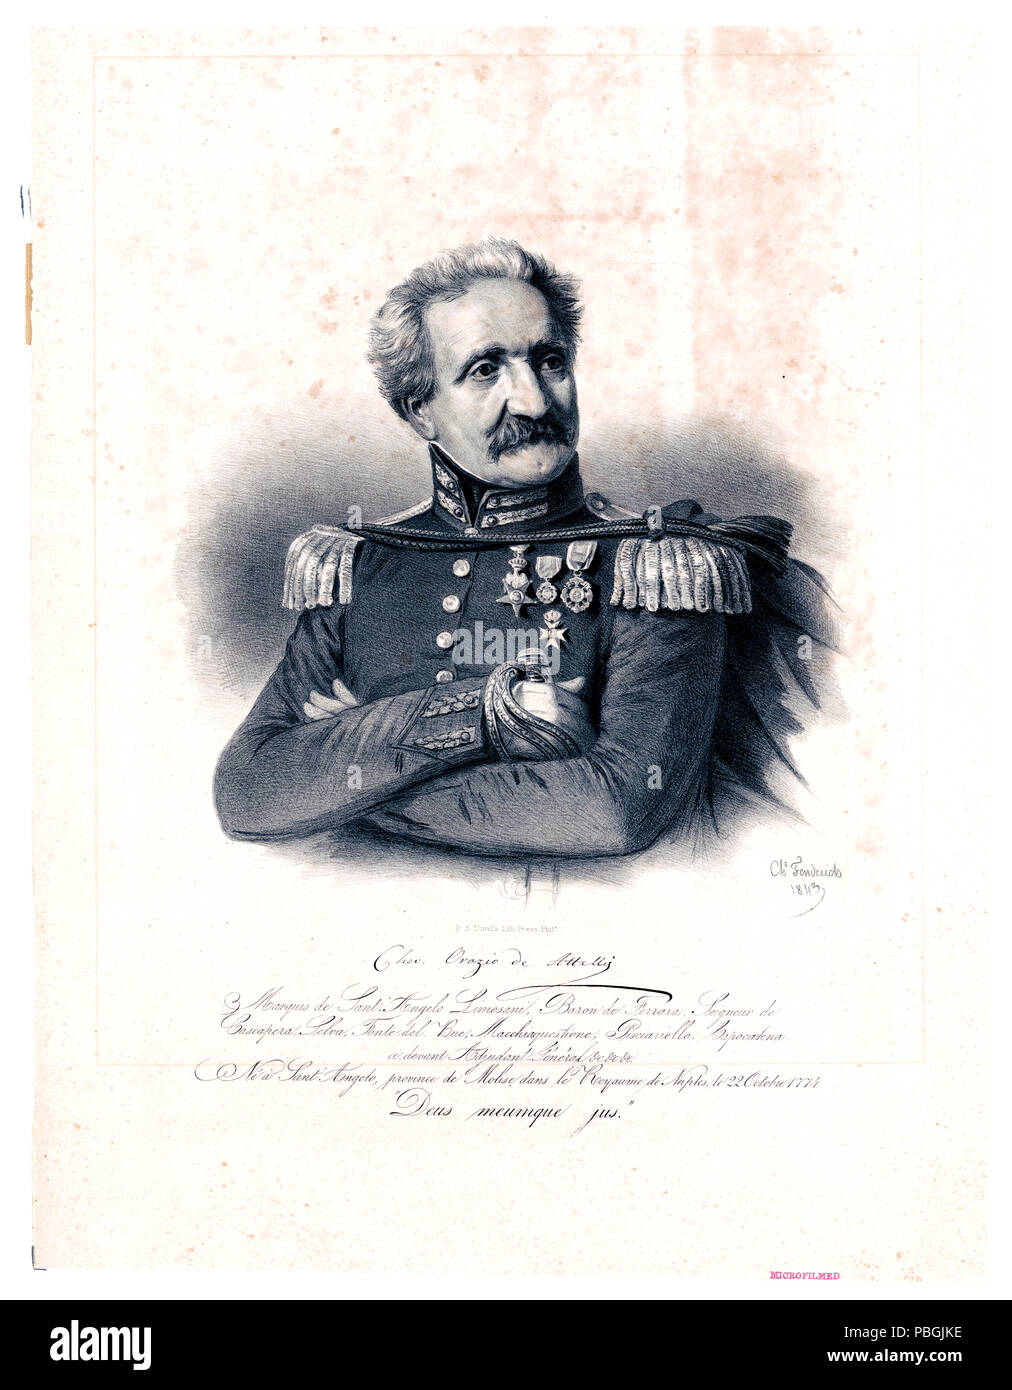 Orazio [Donato Gideon] de Attellis Santangelo, Italian-American patriot, soldier, and political journalist - Stock Image